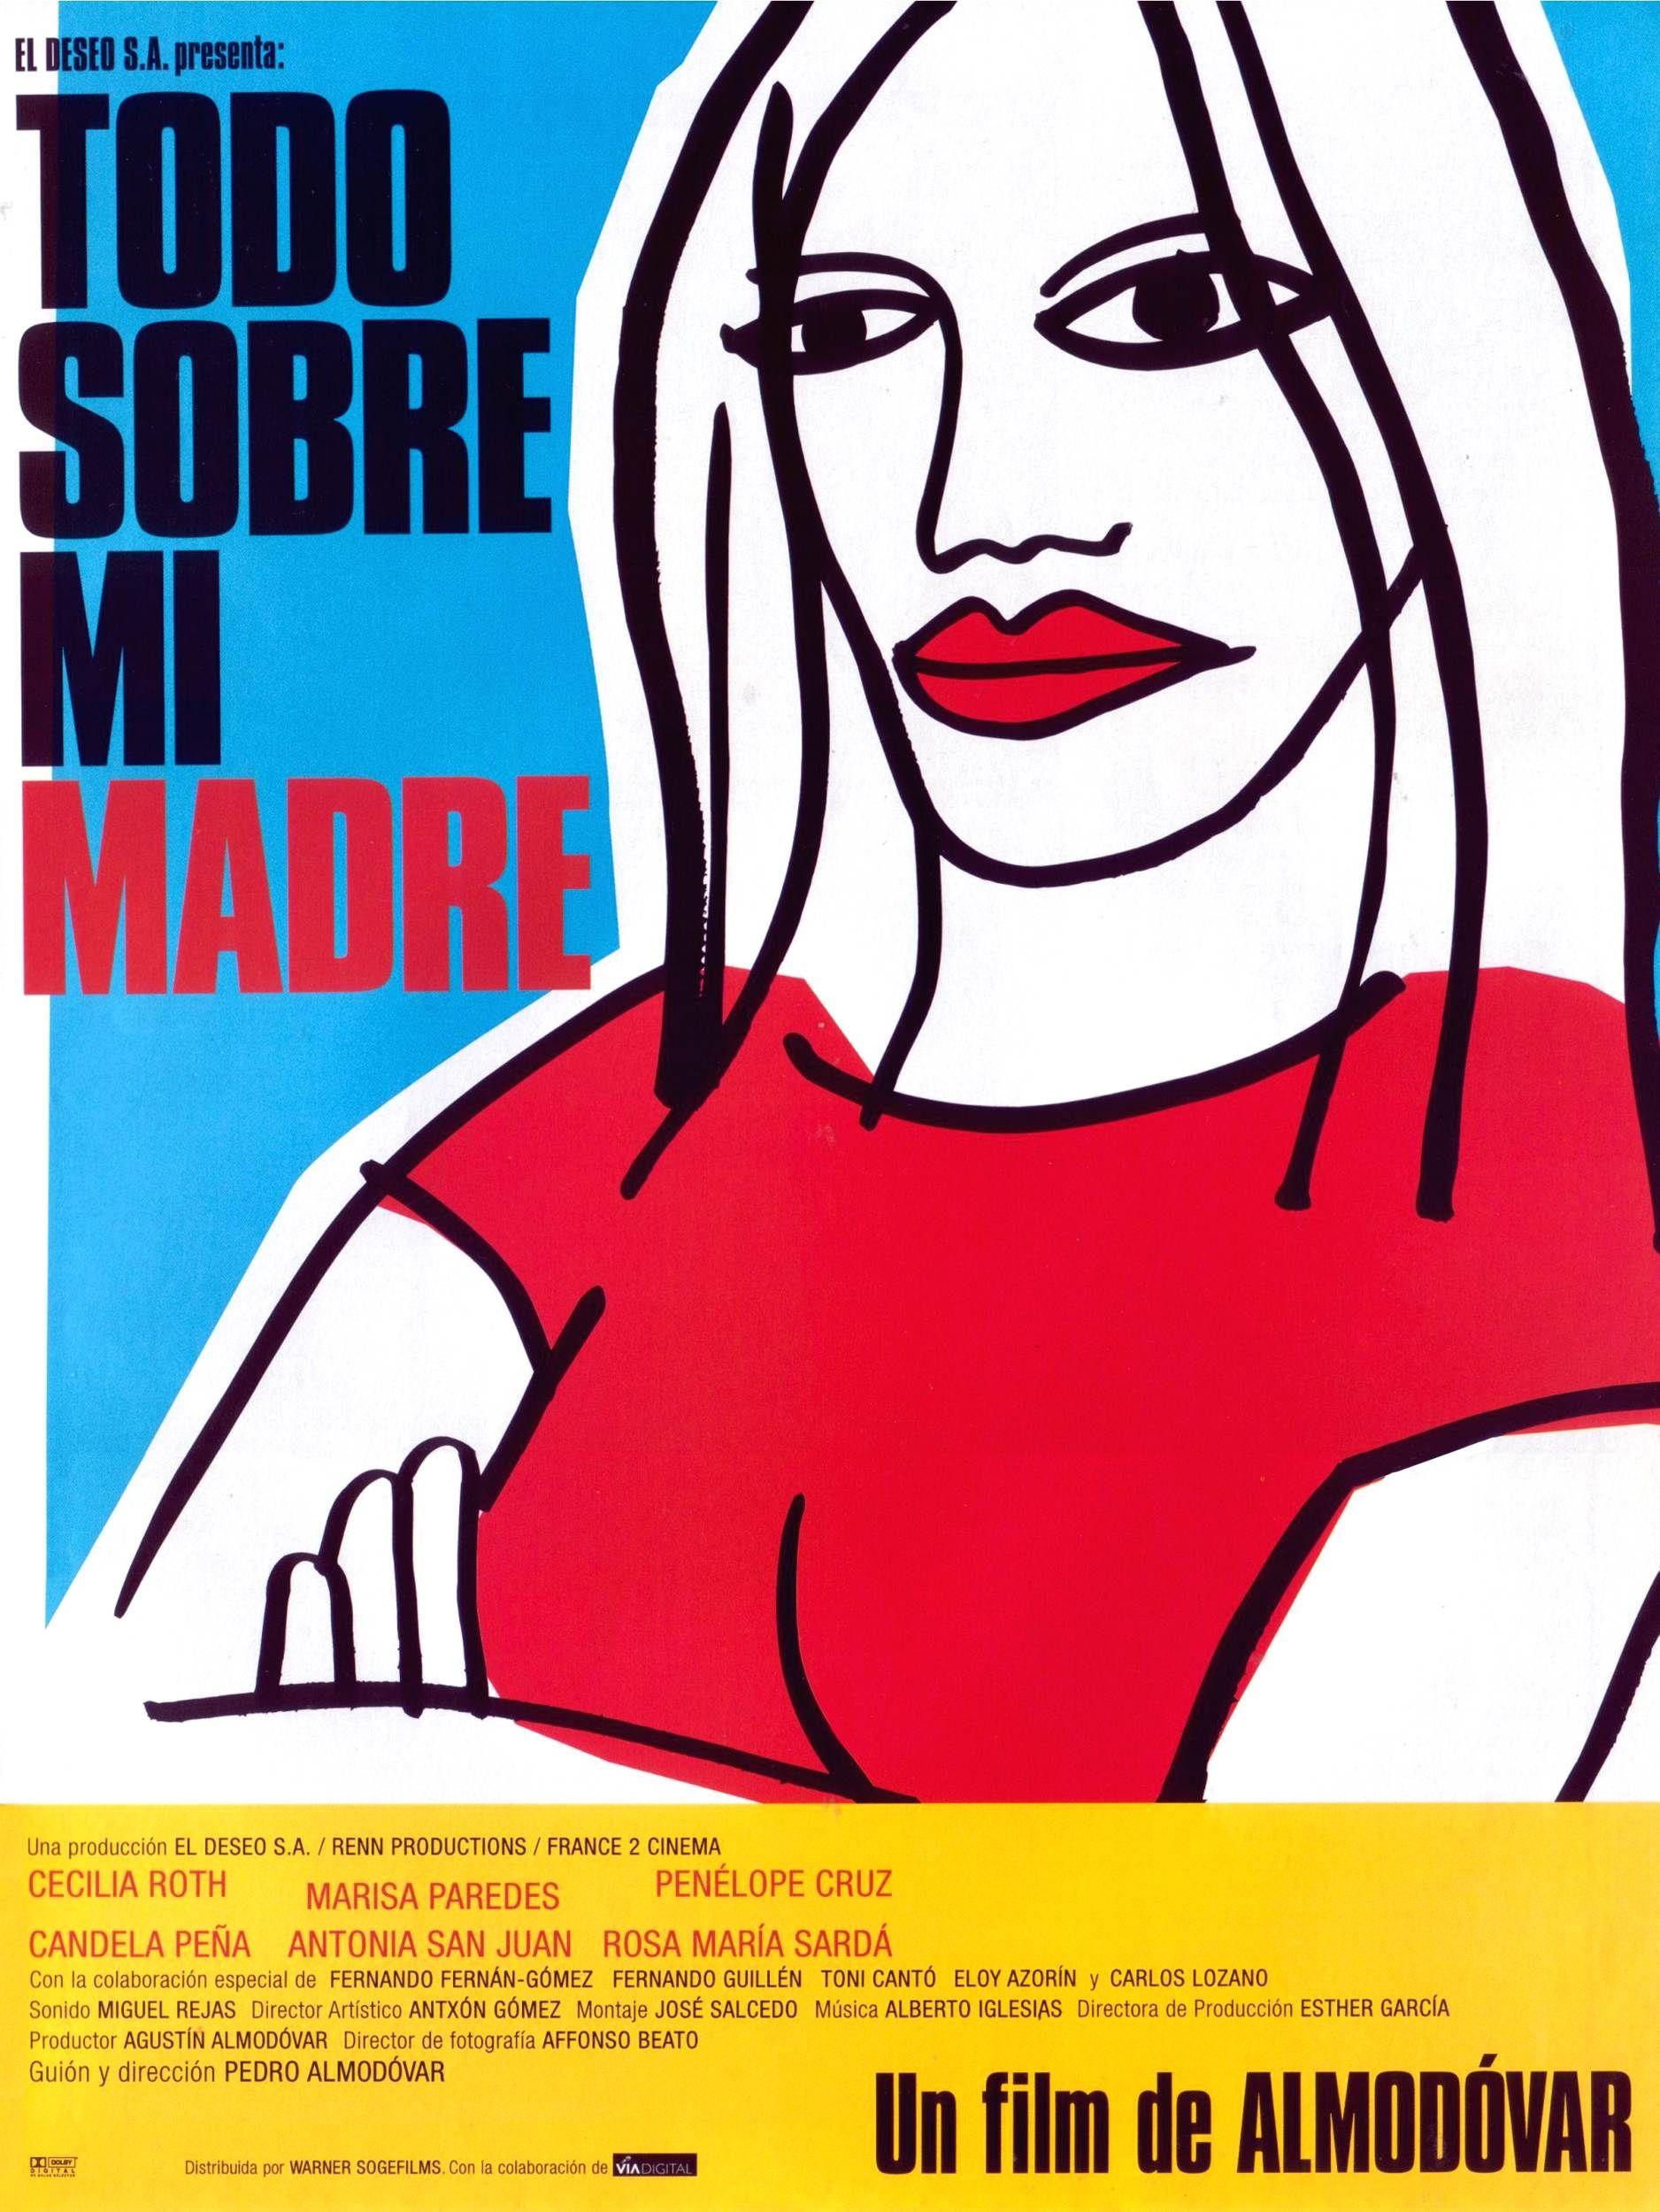 Candela X Escort pinresat sirac on sinematek | all about my mother